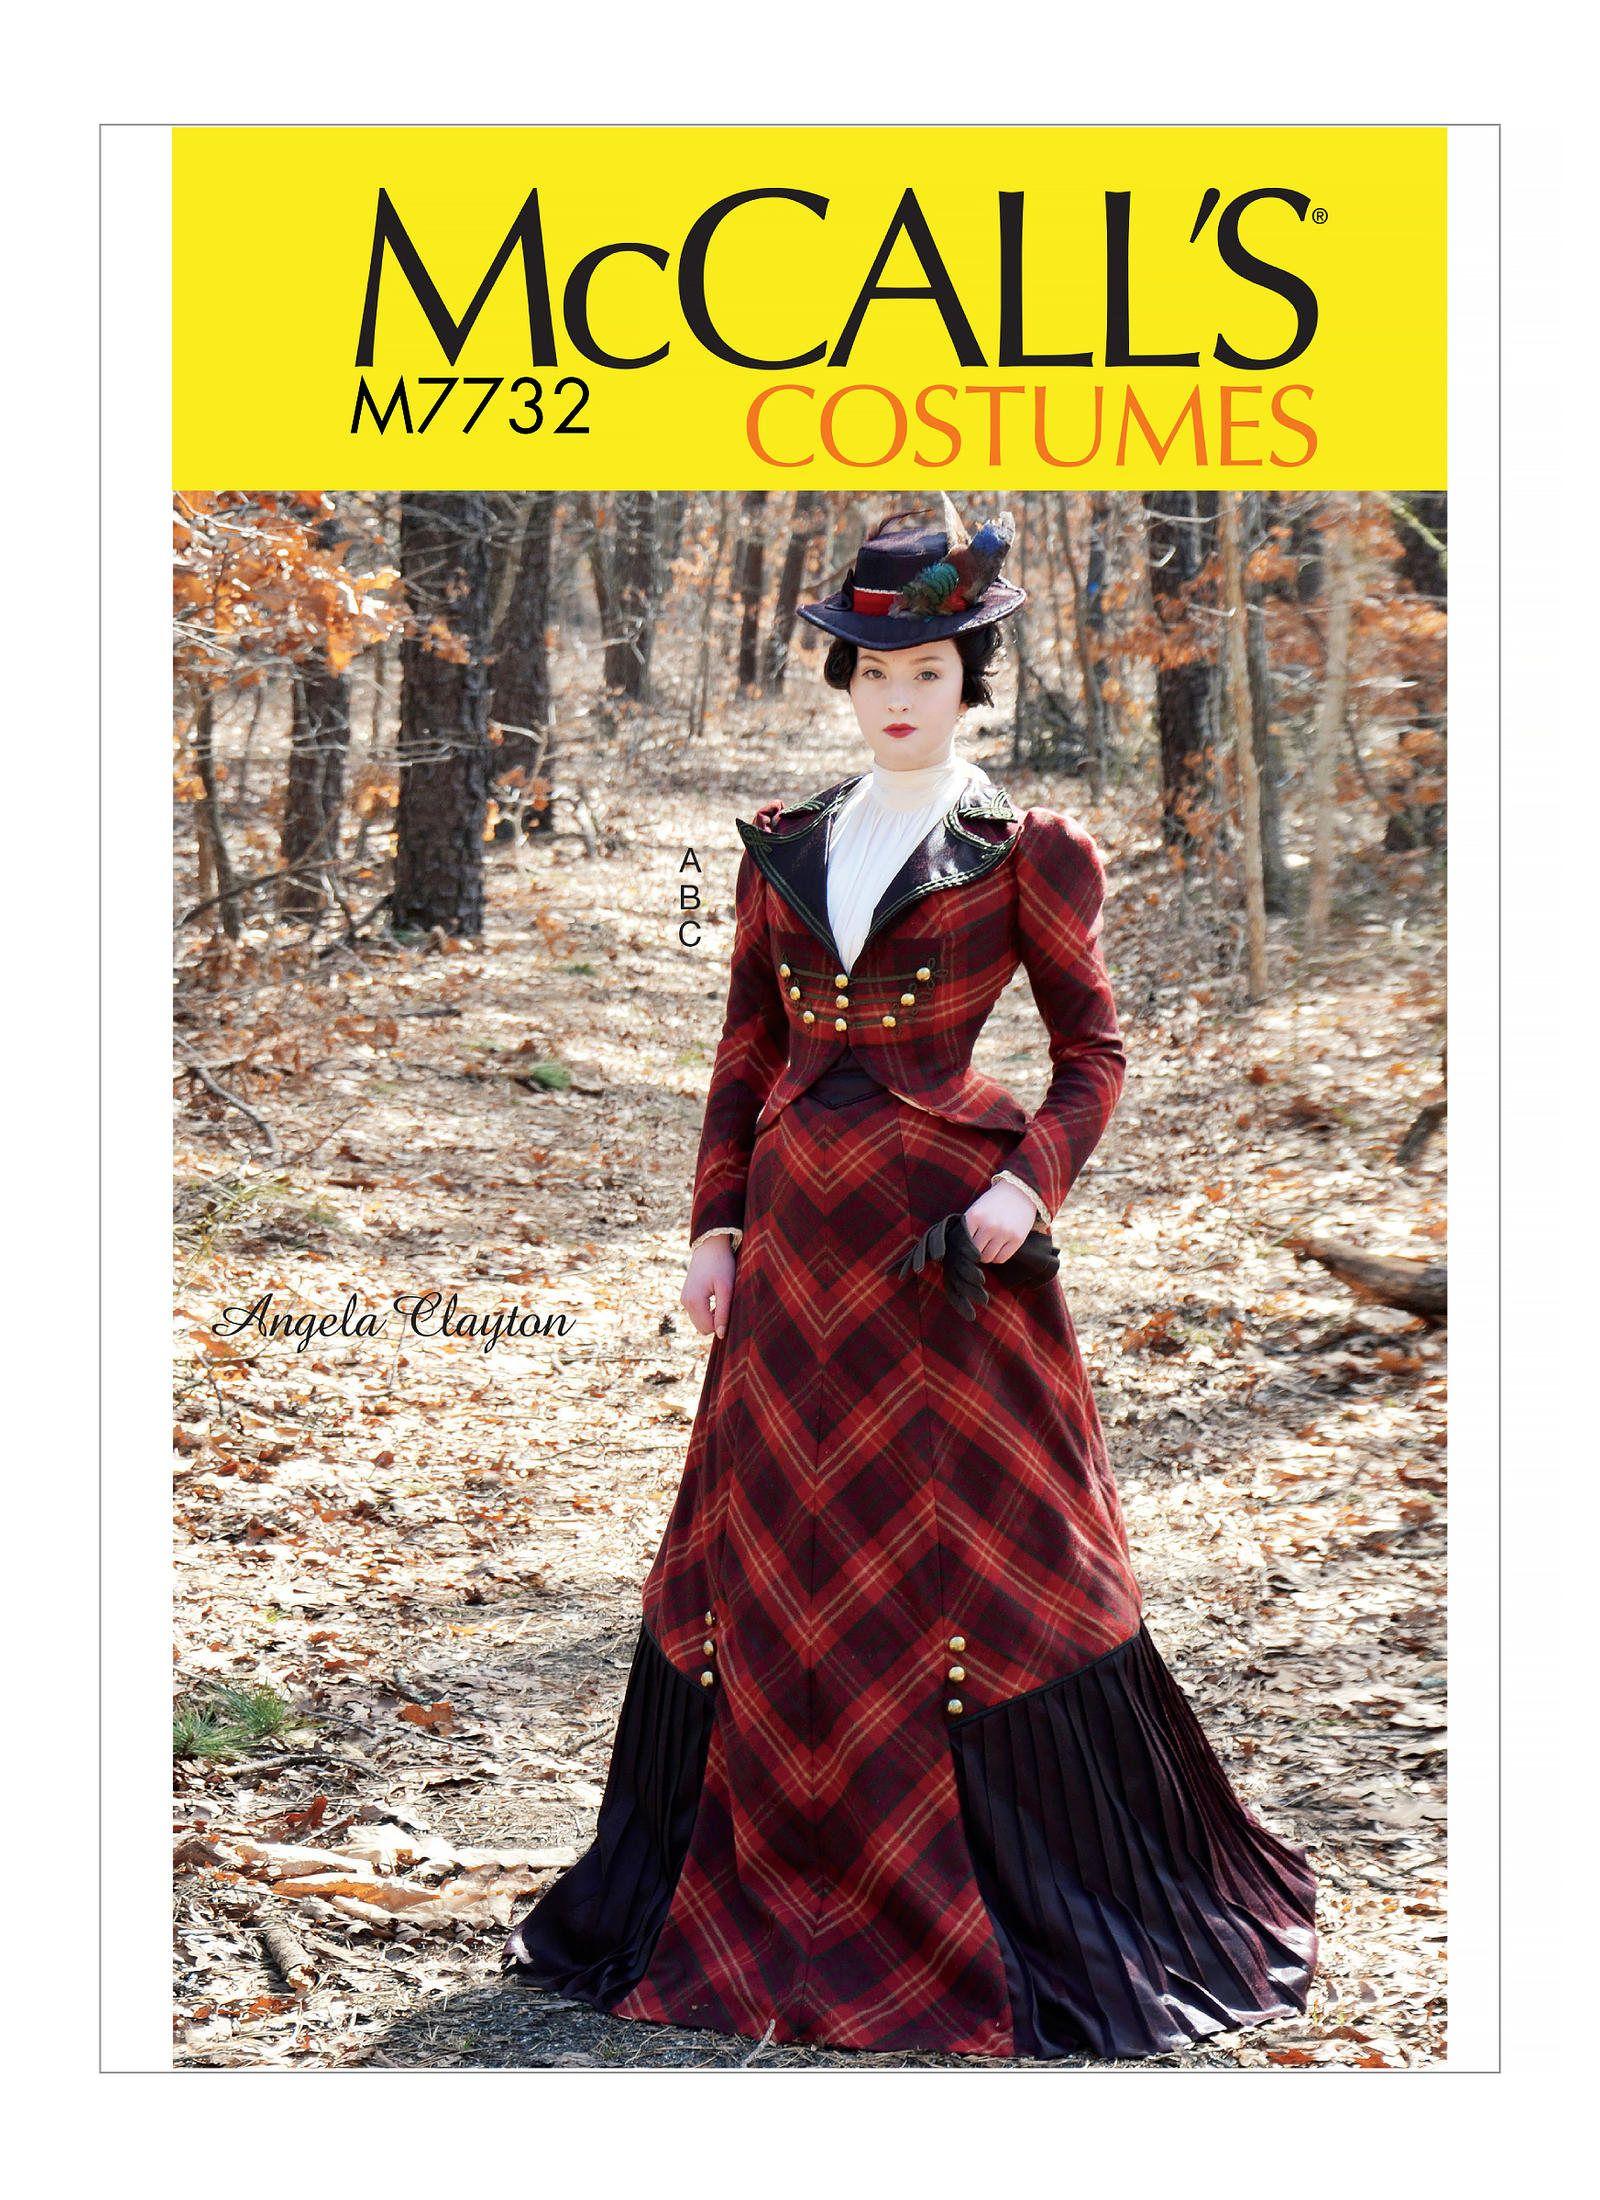 b764ccf02 McCall s sewing pattern 7732 Angela Clayton Victorian Era 1800s ...